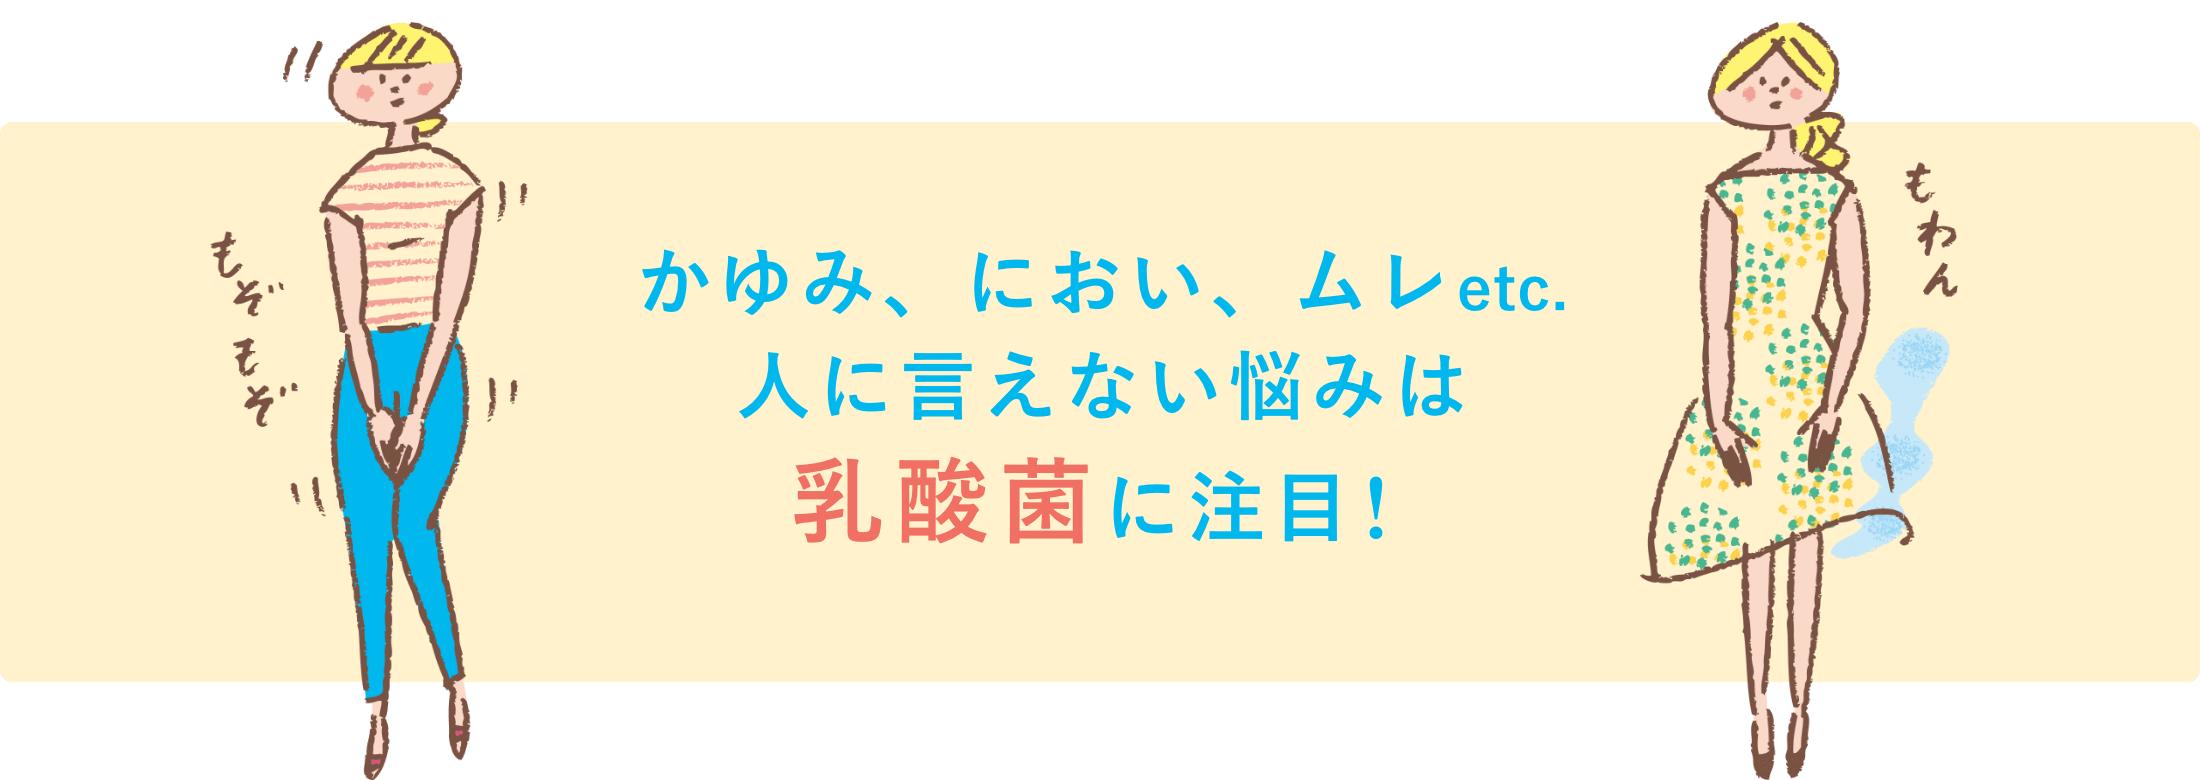 PC_大鵬薬品_乳酸菌Rosell(ローゼル)-11&52